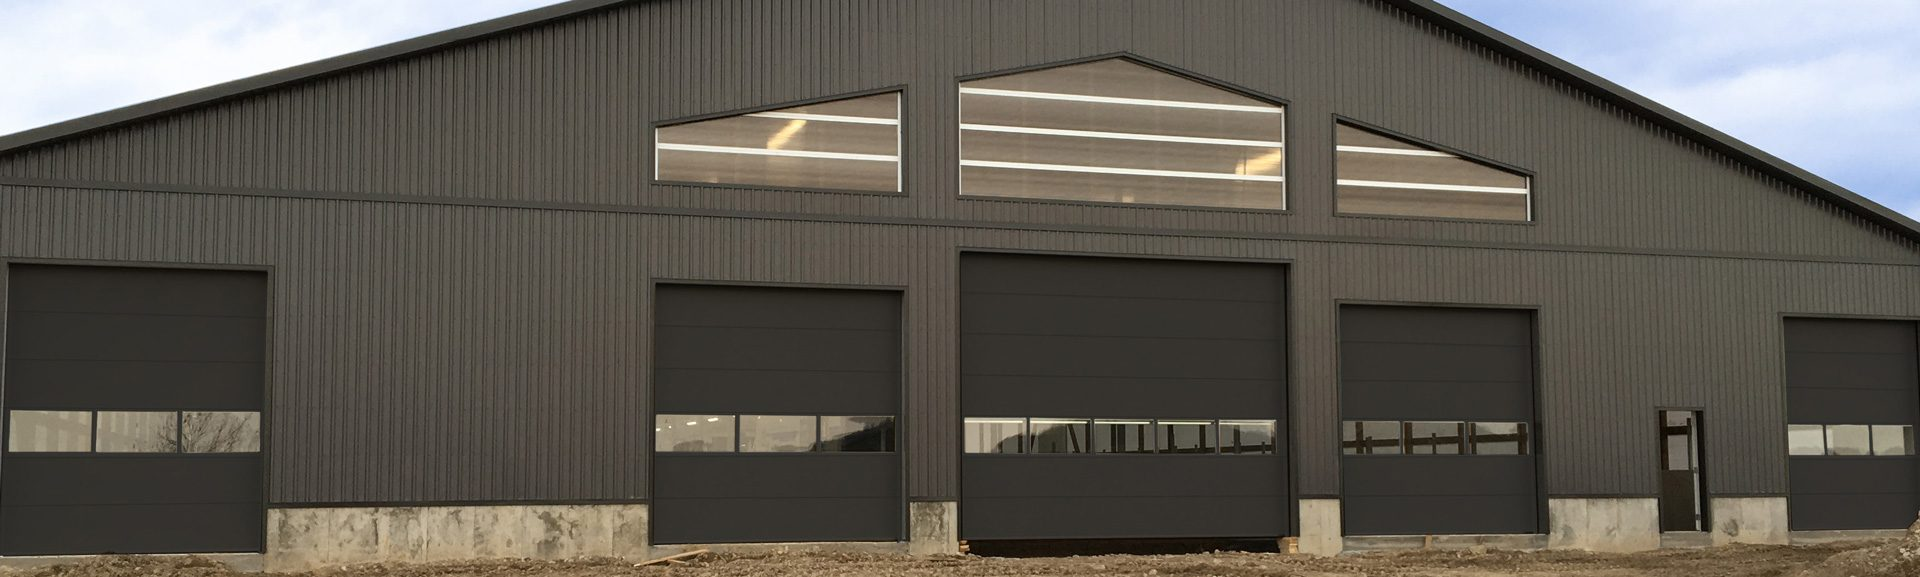 Home - Raynor Garage Doors